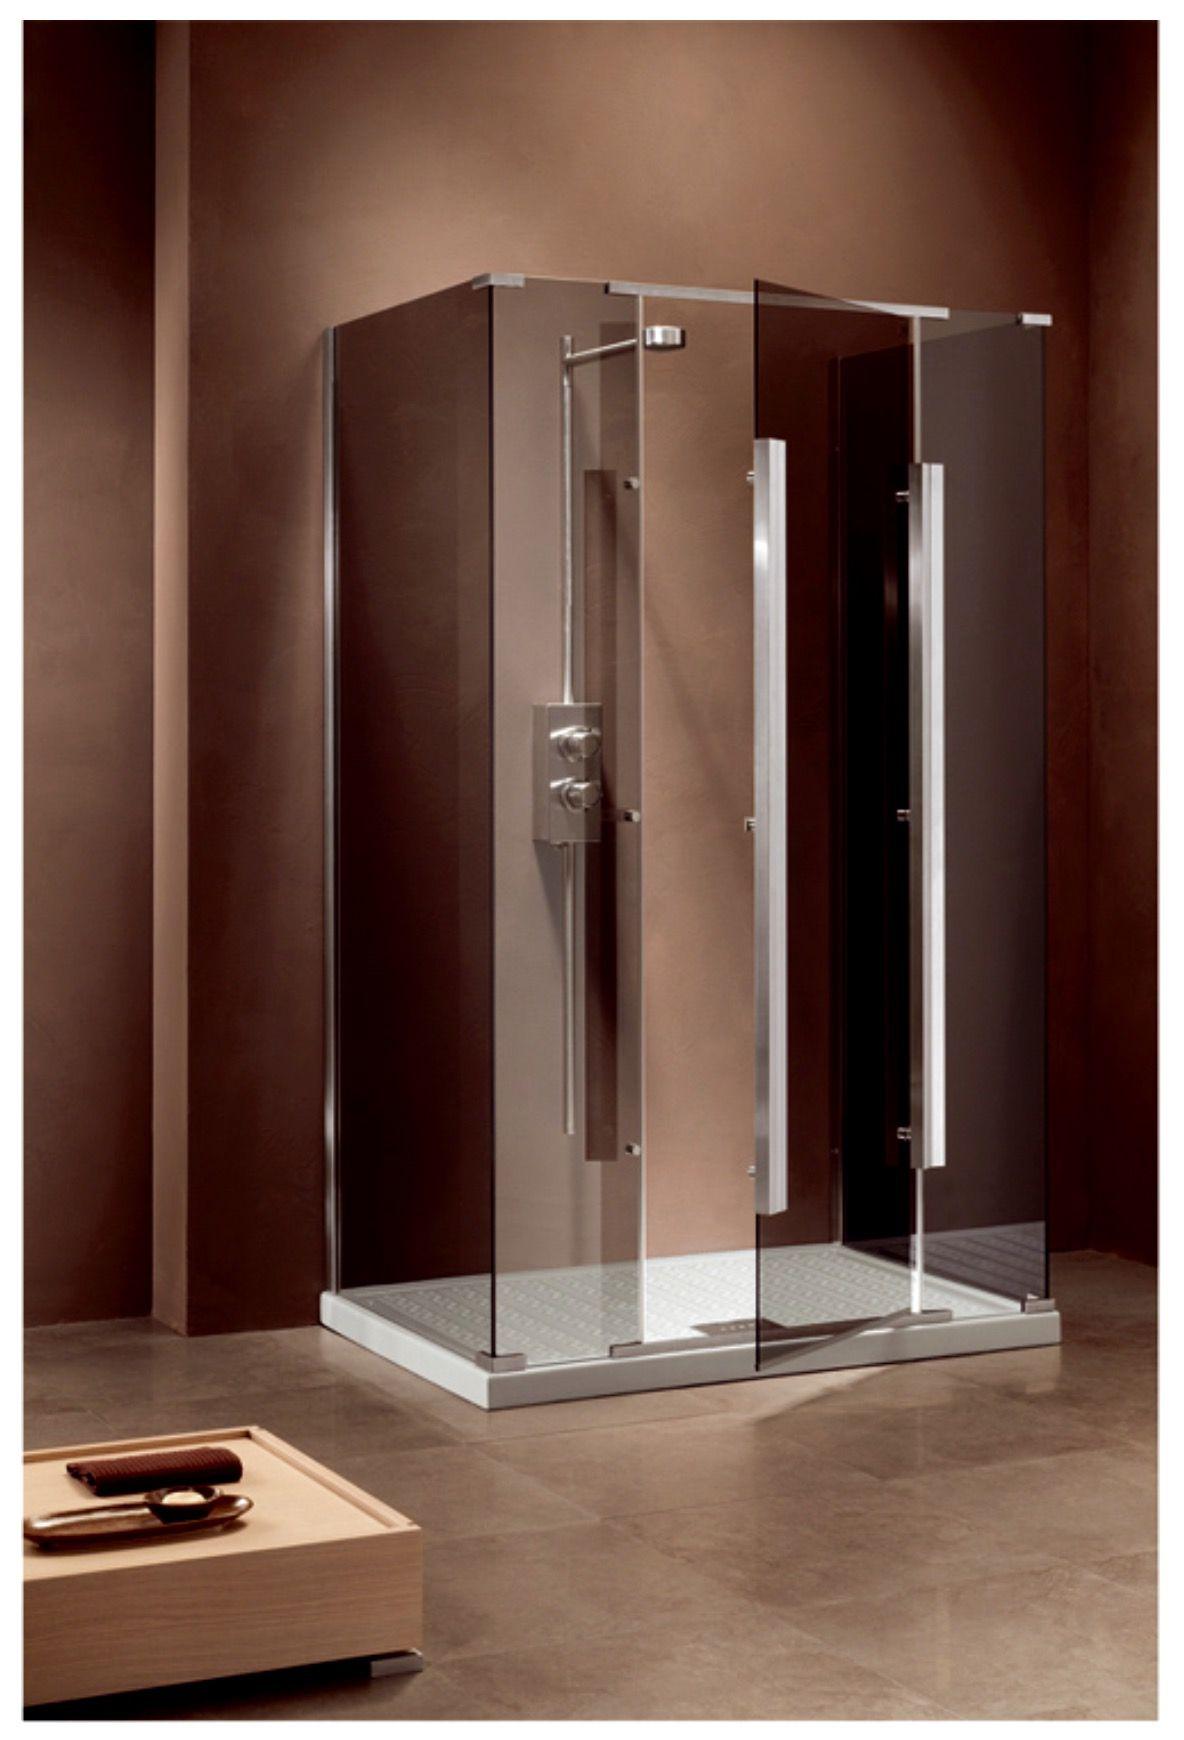 cabine design futuriste bathroom pinterest douche et cabine. Black Bedroom Furniture Sets. Home Design Ideas